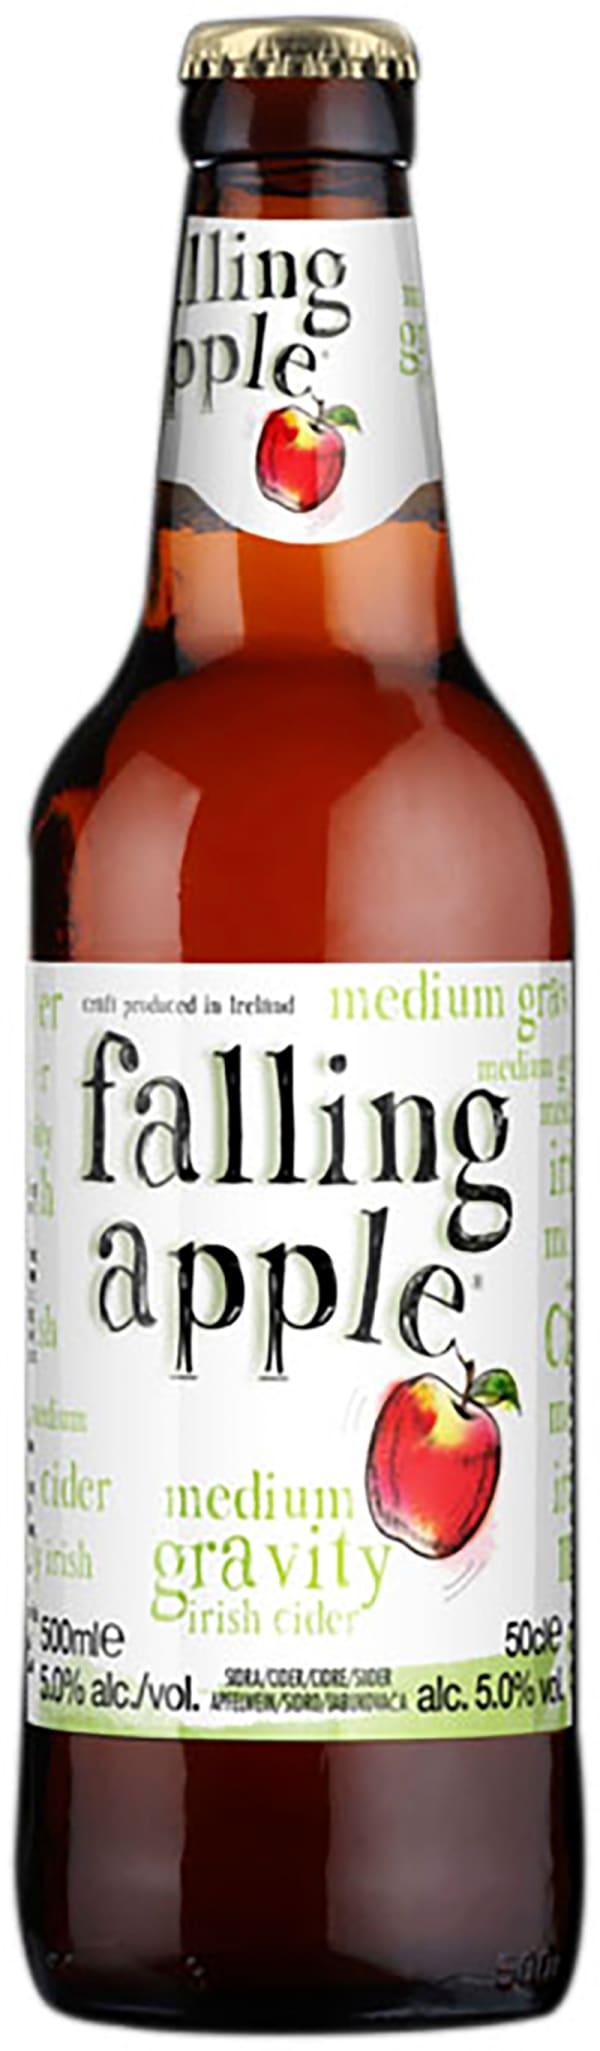 Falling Apple Cider